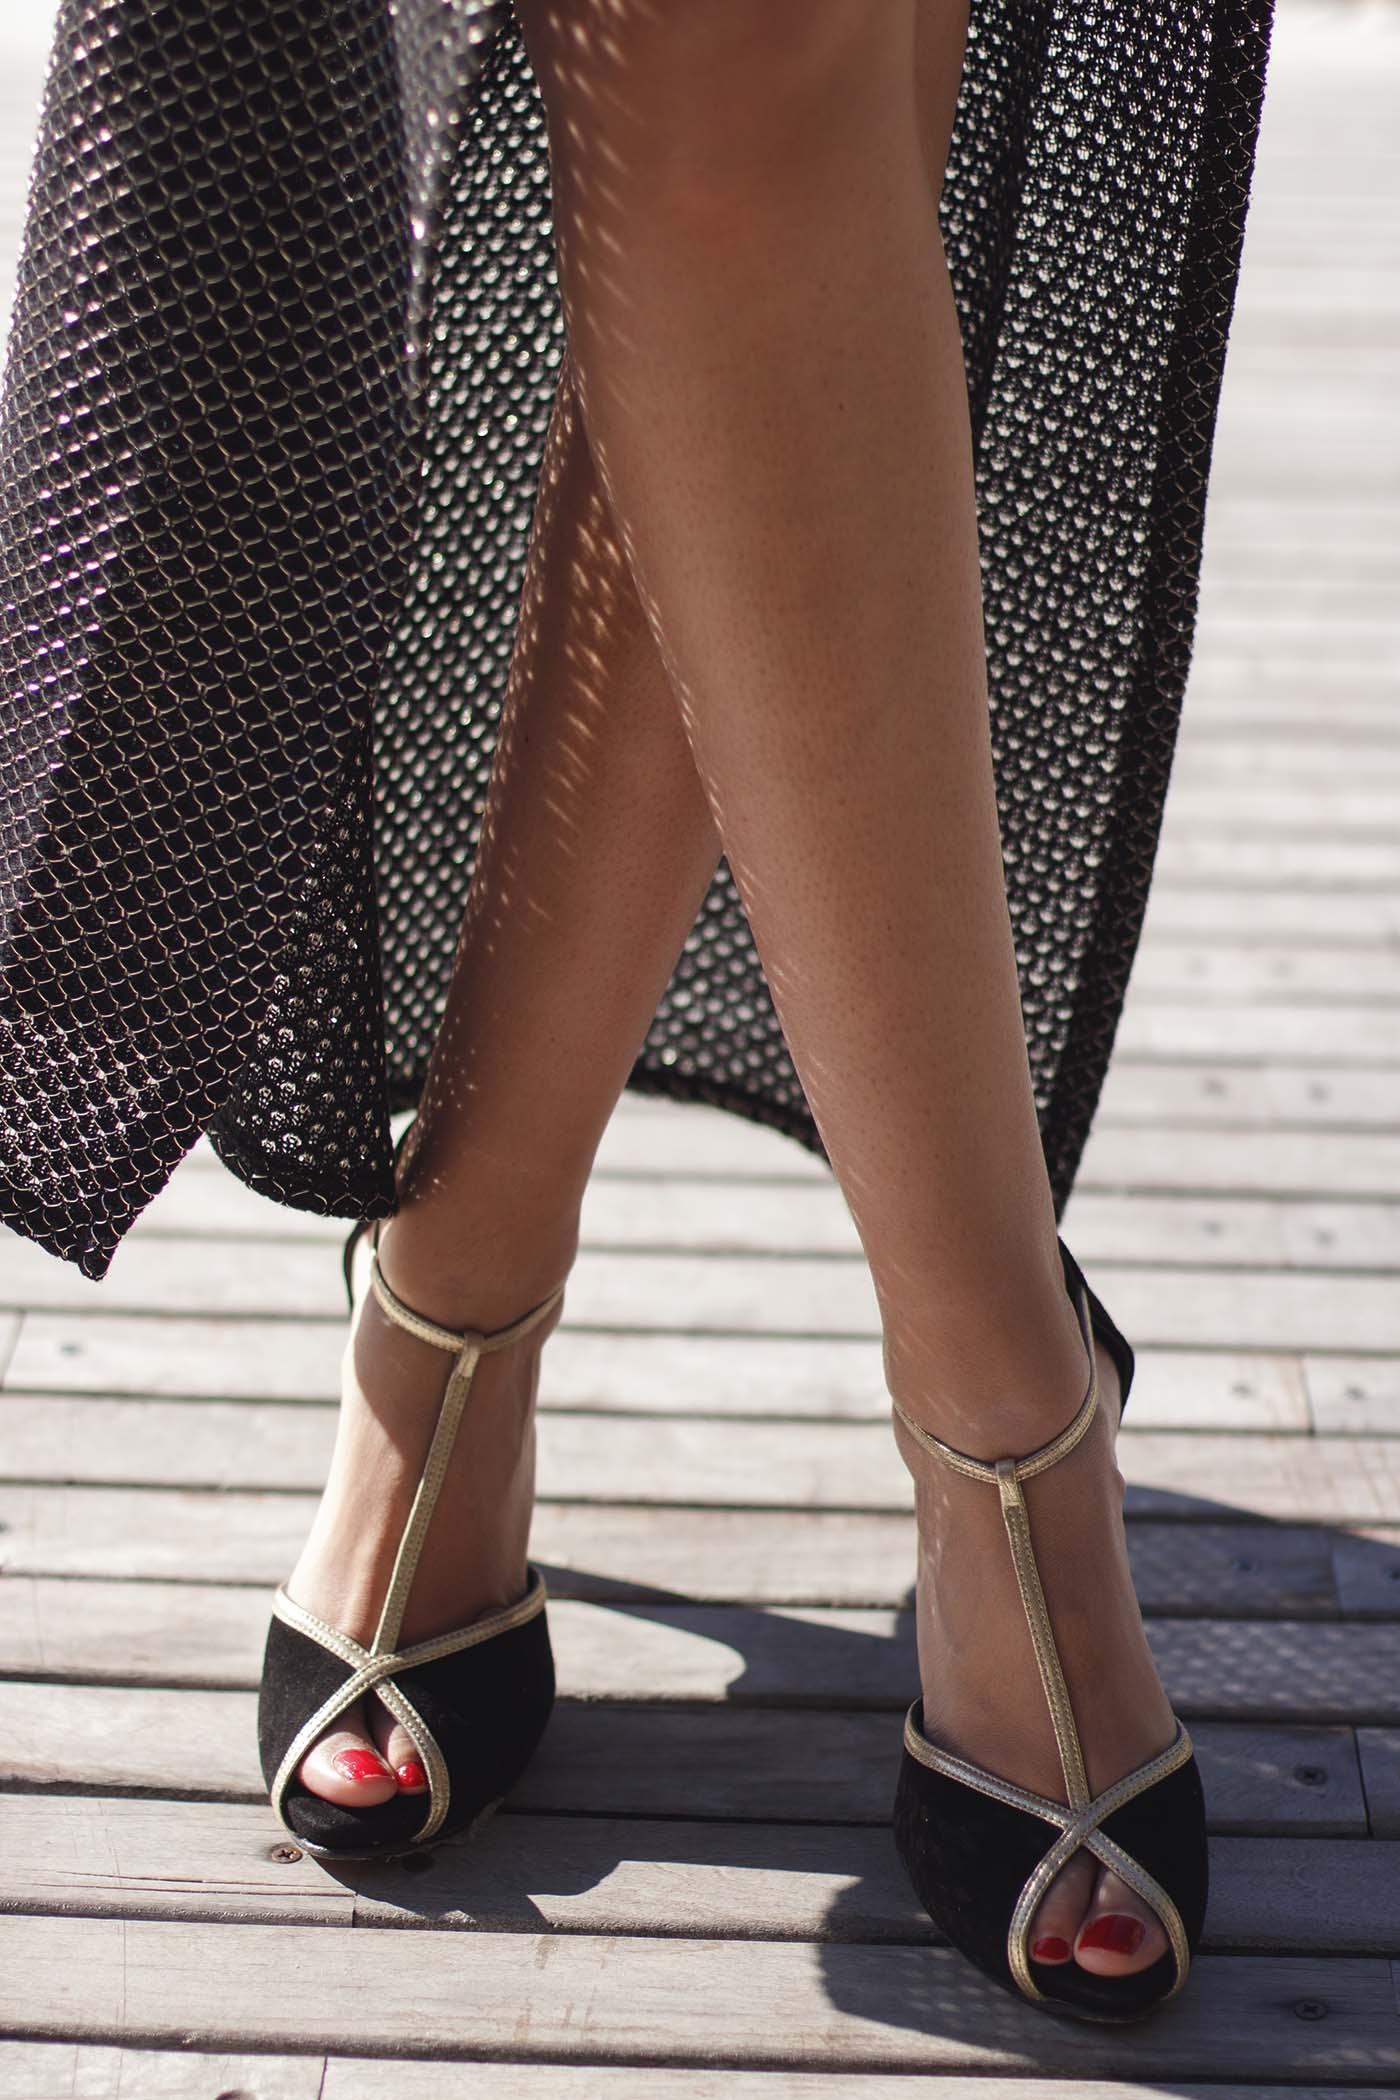 Zapatos fiesta madrid